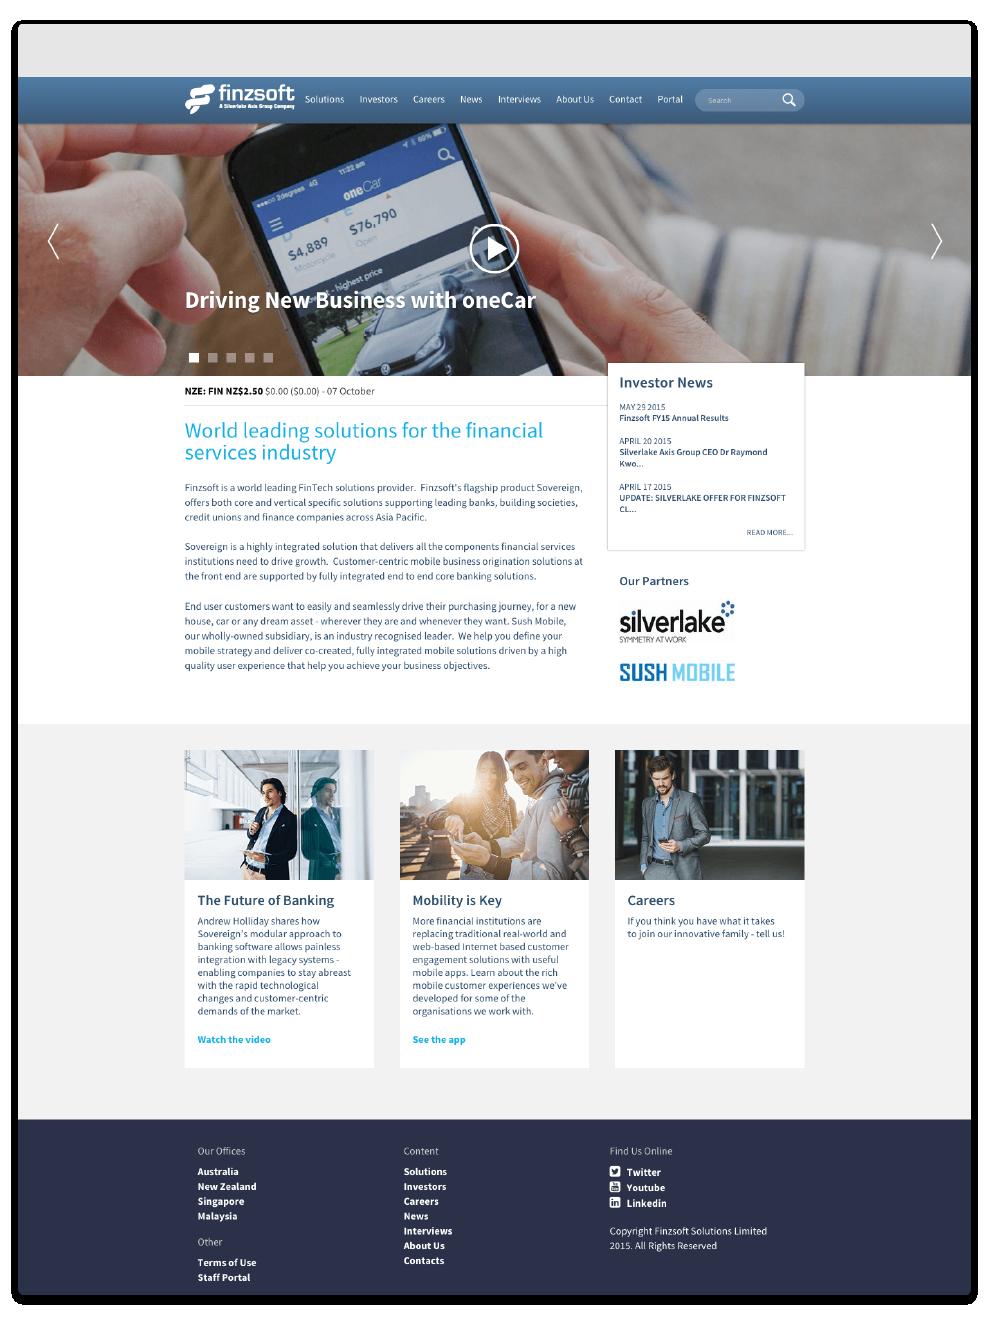 Screenshot of the homepage of the Finzsoft responsive website